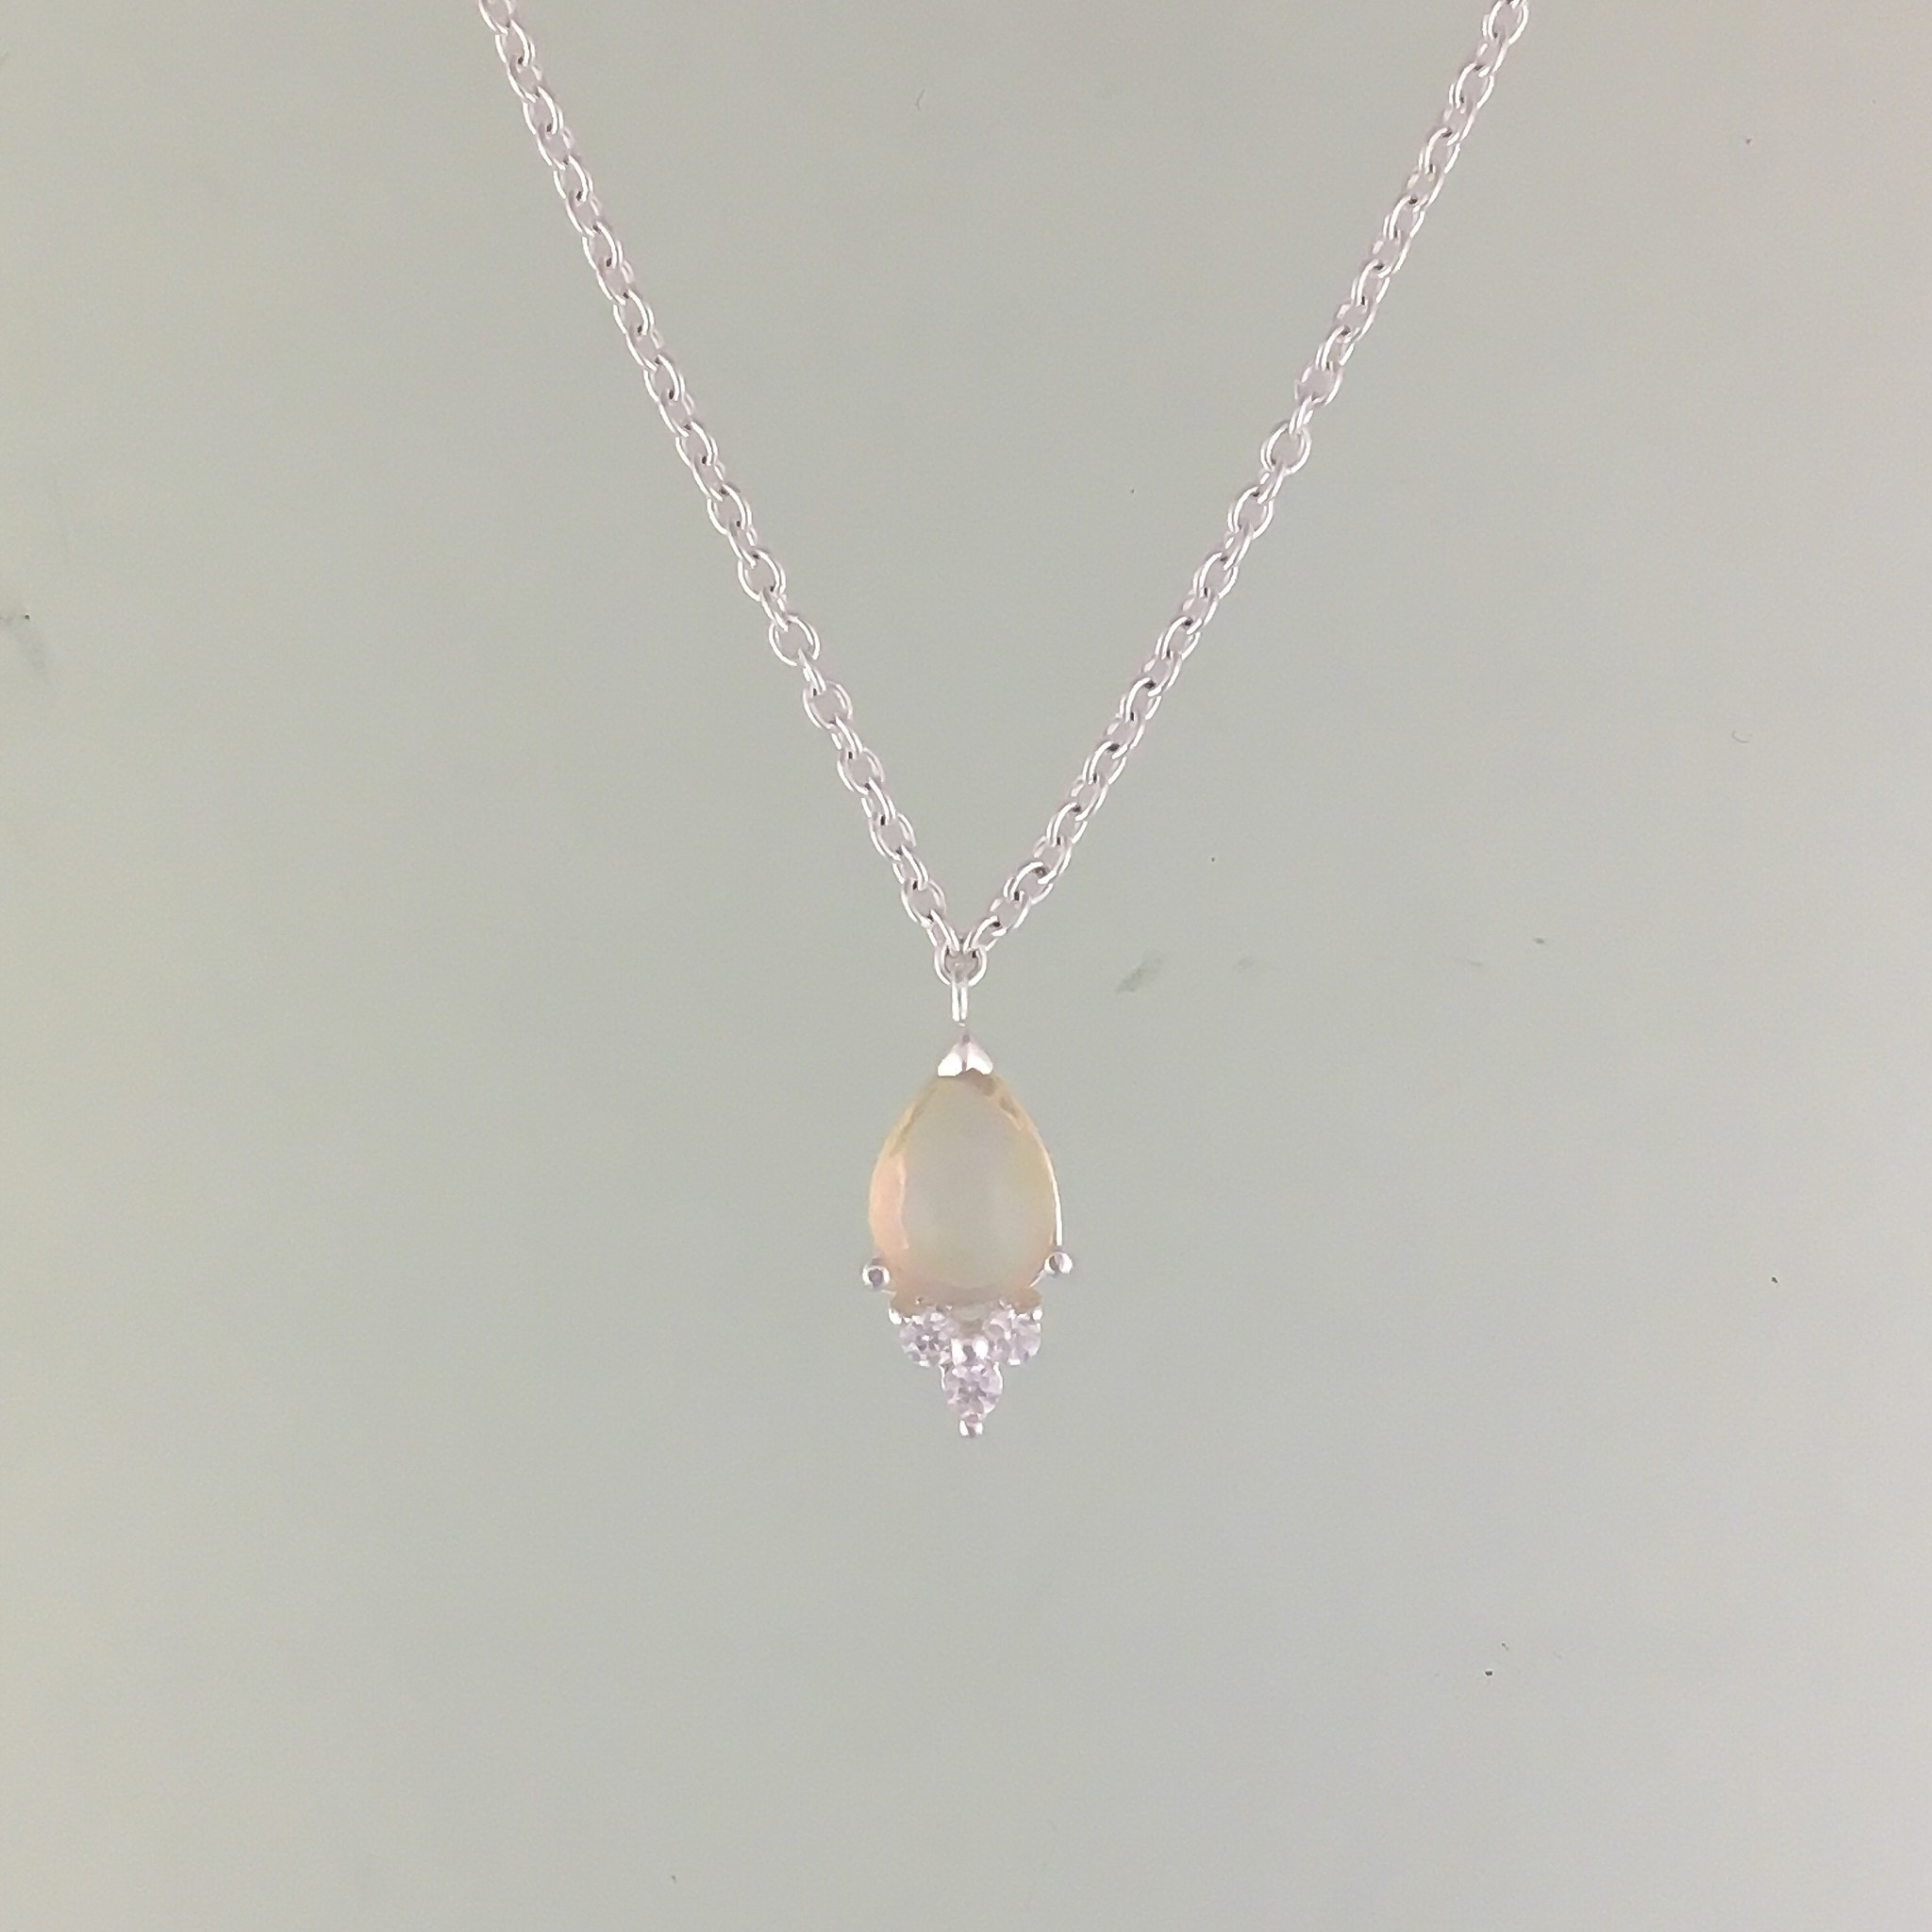 Tashi Tashi Pear Opal Necklace with CZ